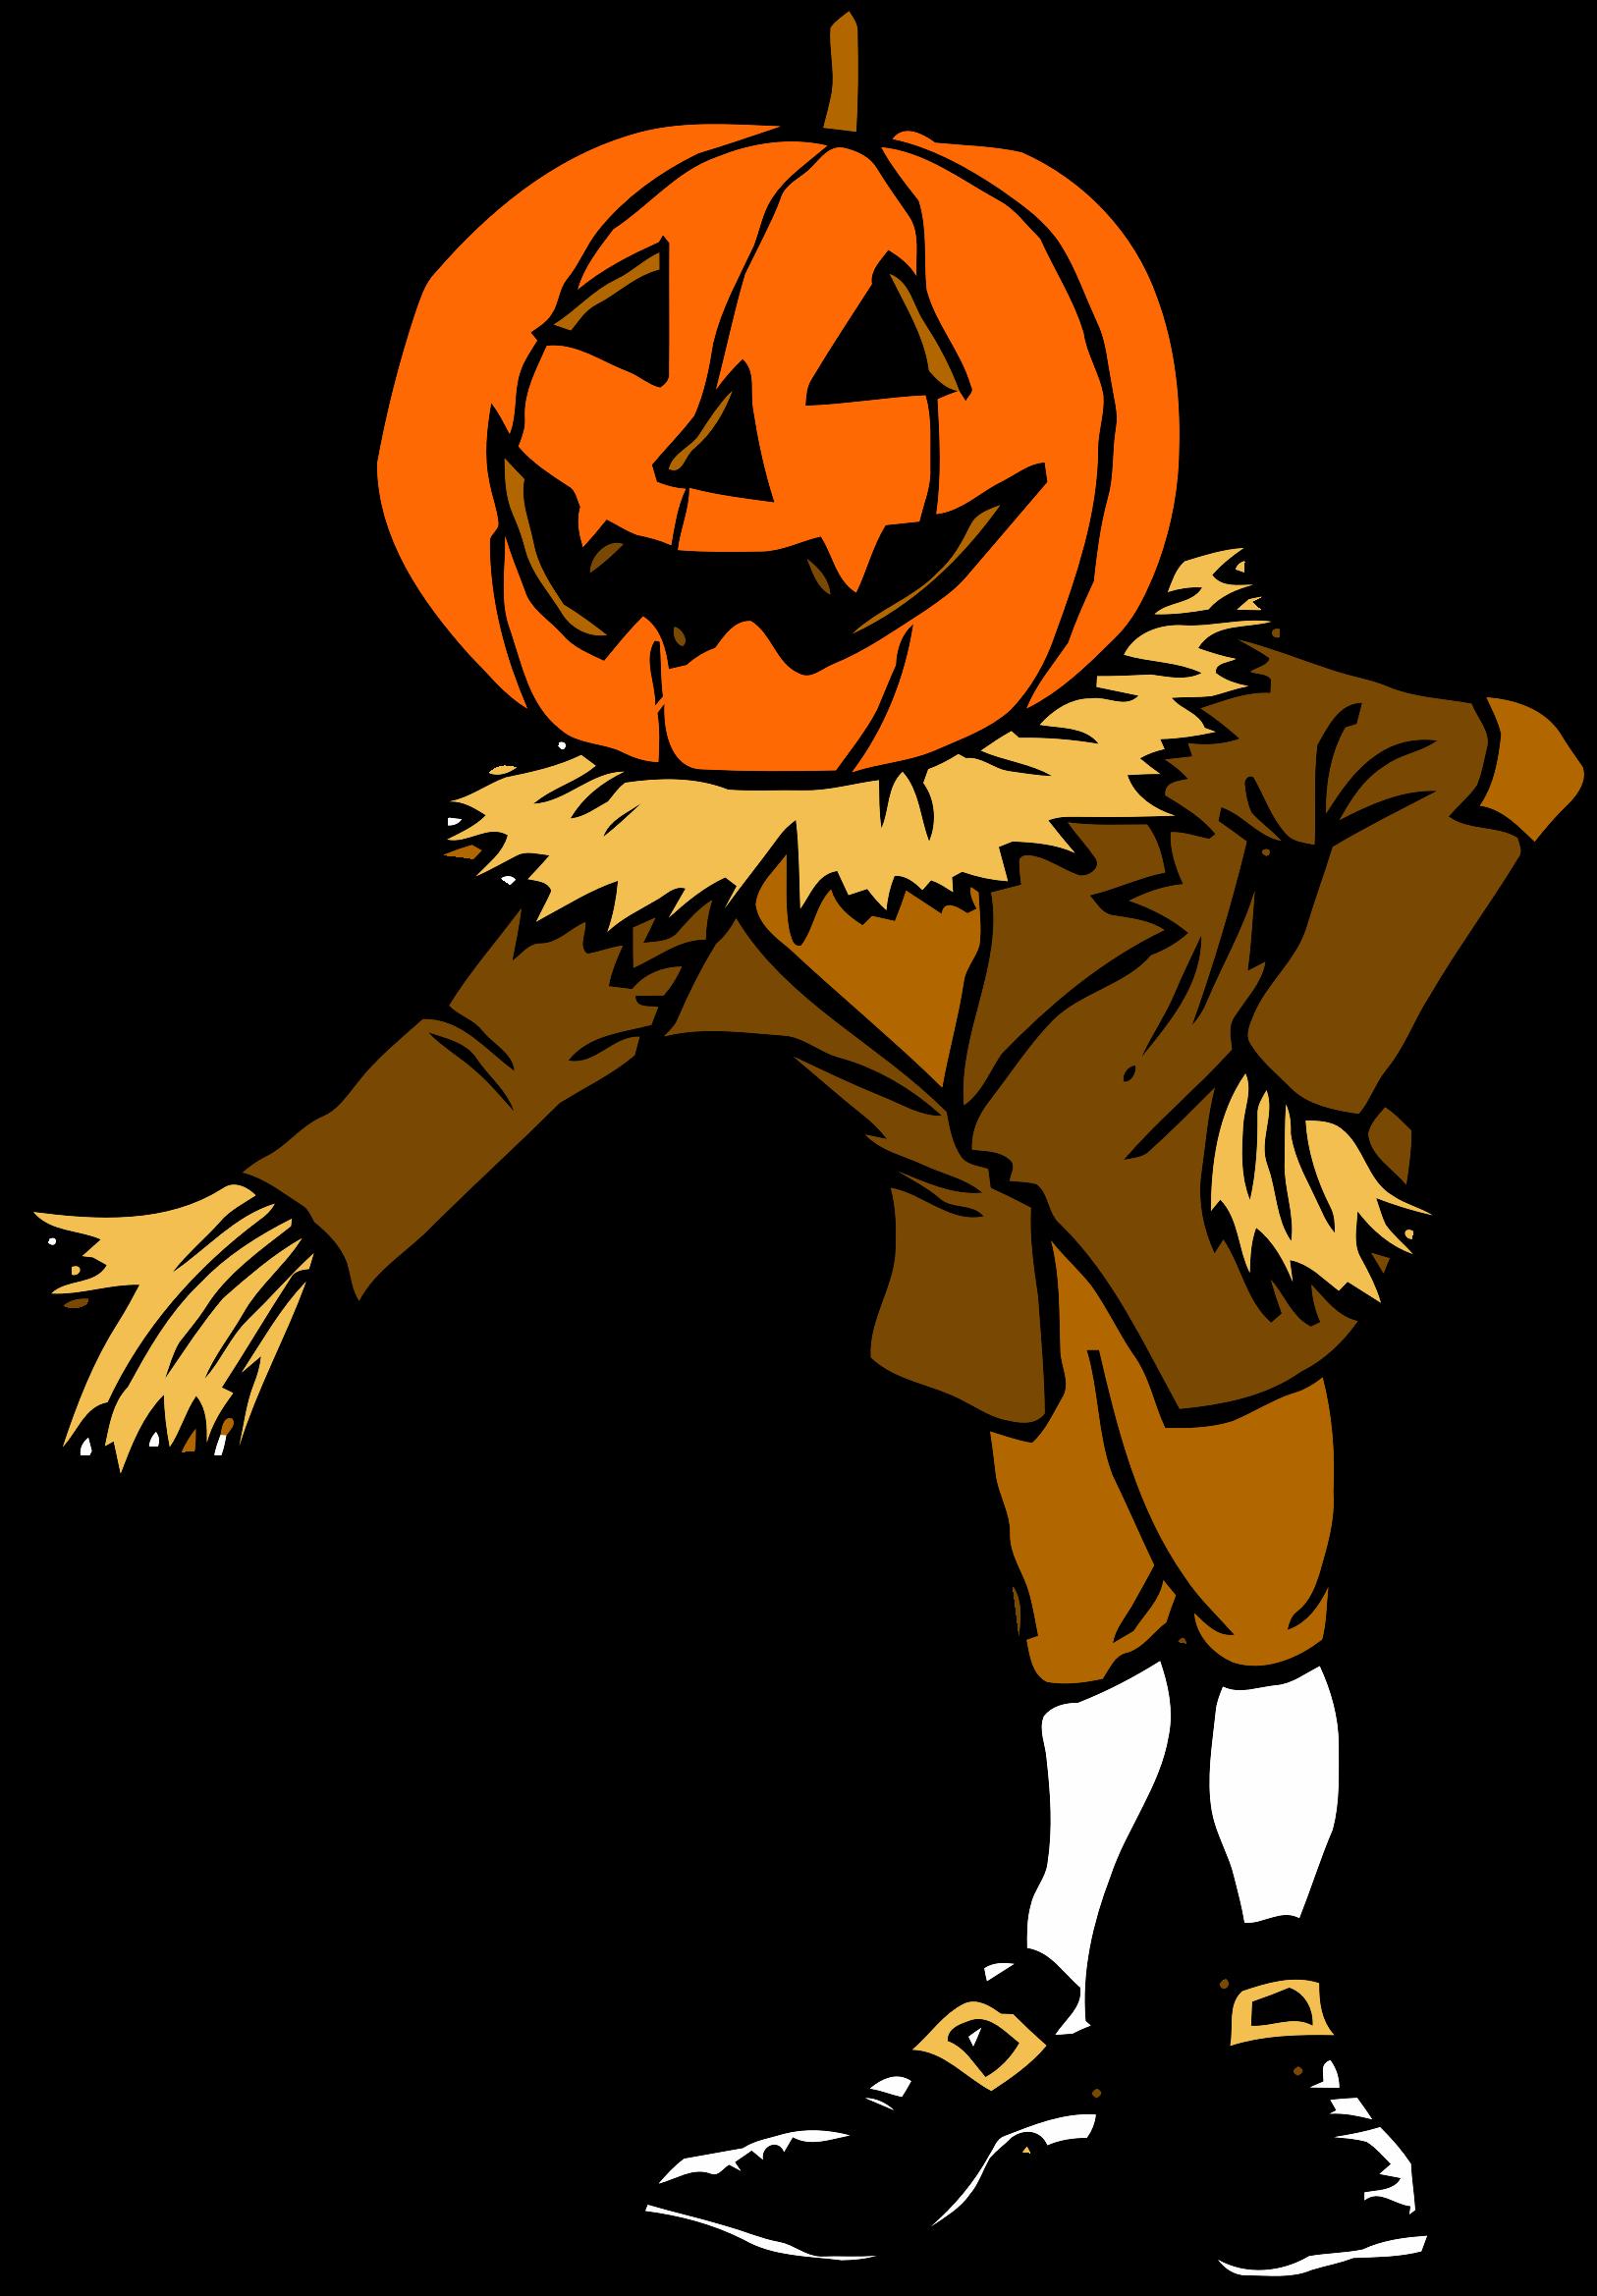 Halloween costume clipart png svg transparent download Clipart - Jack-'O-Lantern Costume svg transparent download